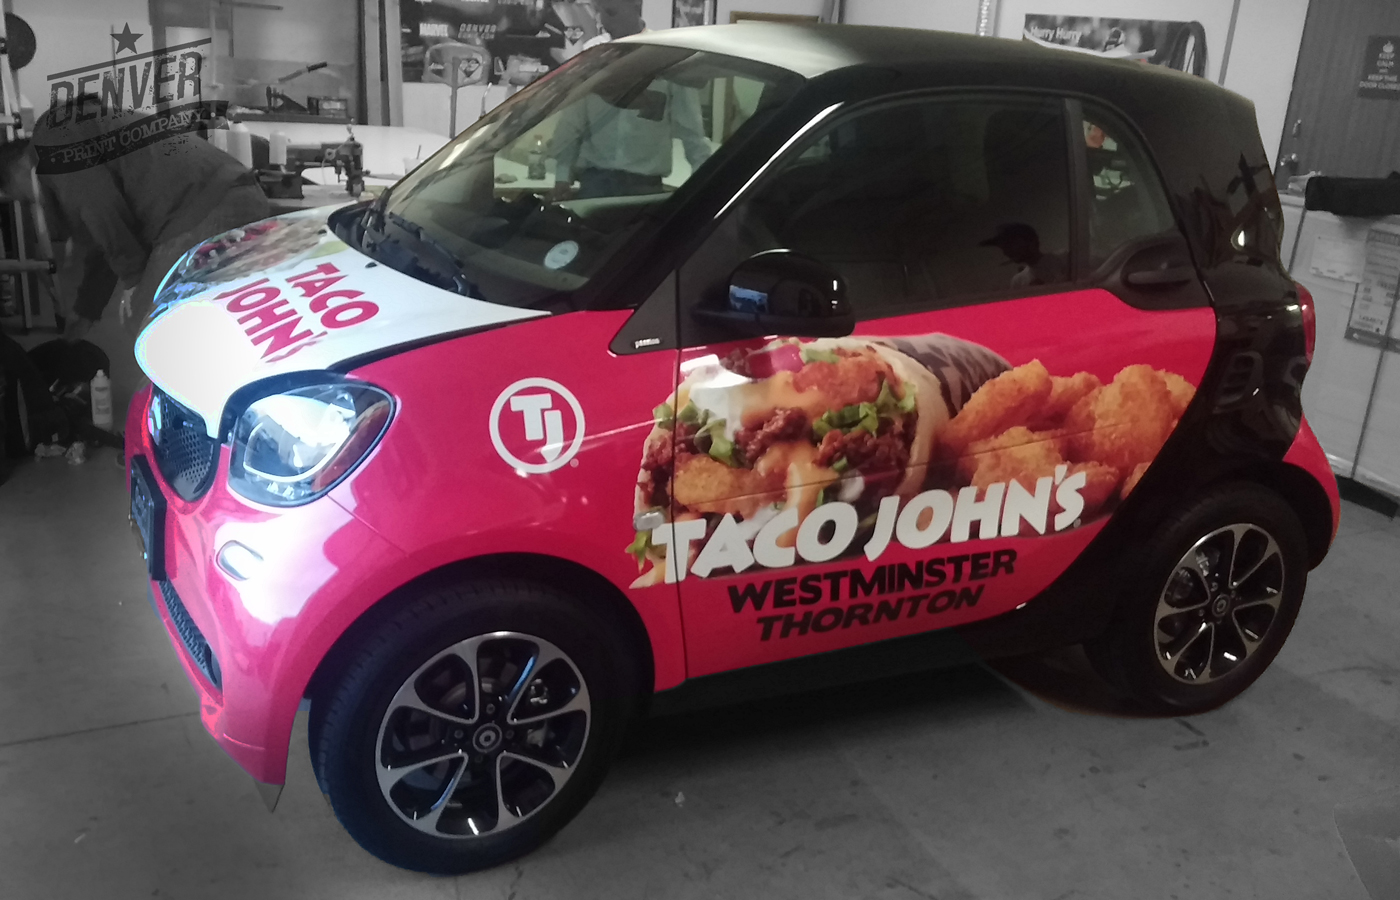 Taco Johns smart car full wrap by Denver Print Company